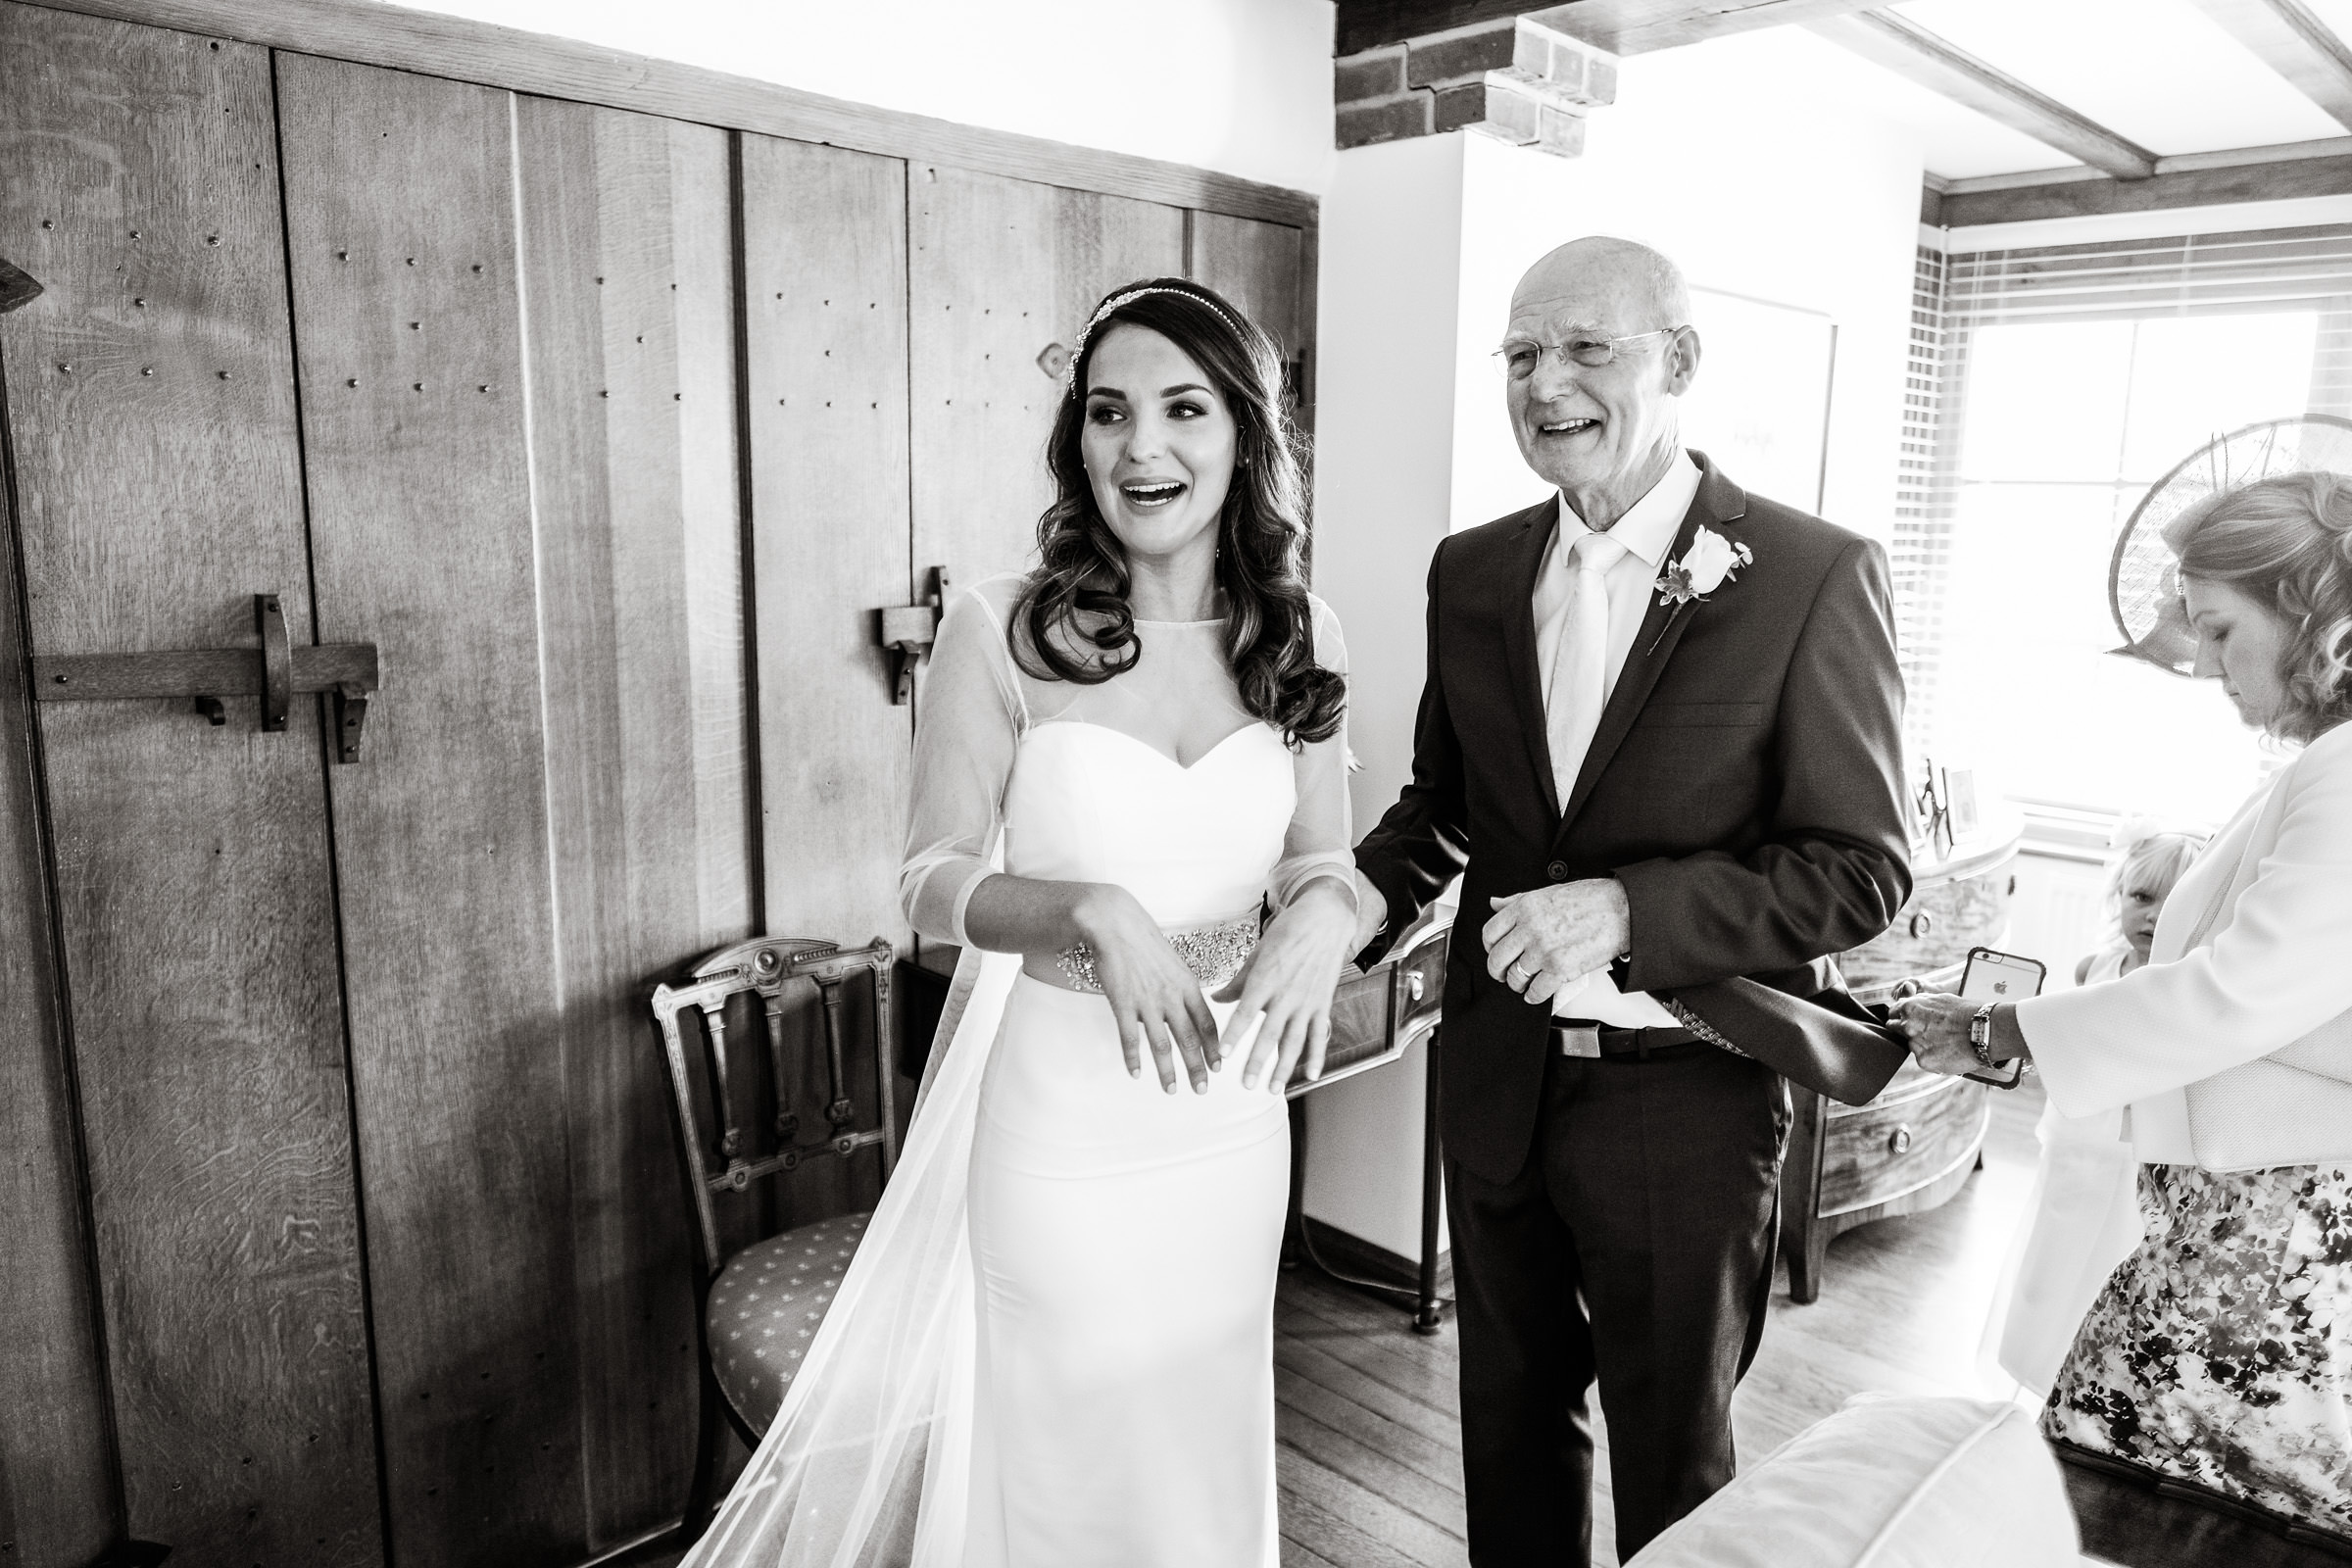 Wedding+Photography+Surrey+007.jpg